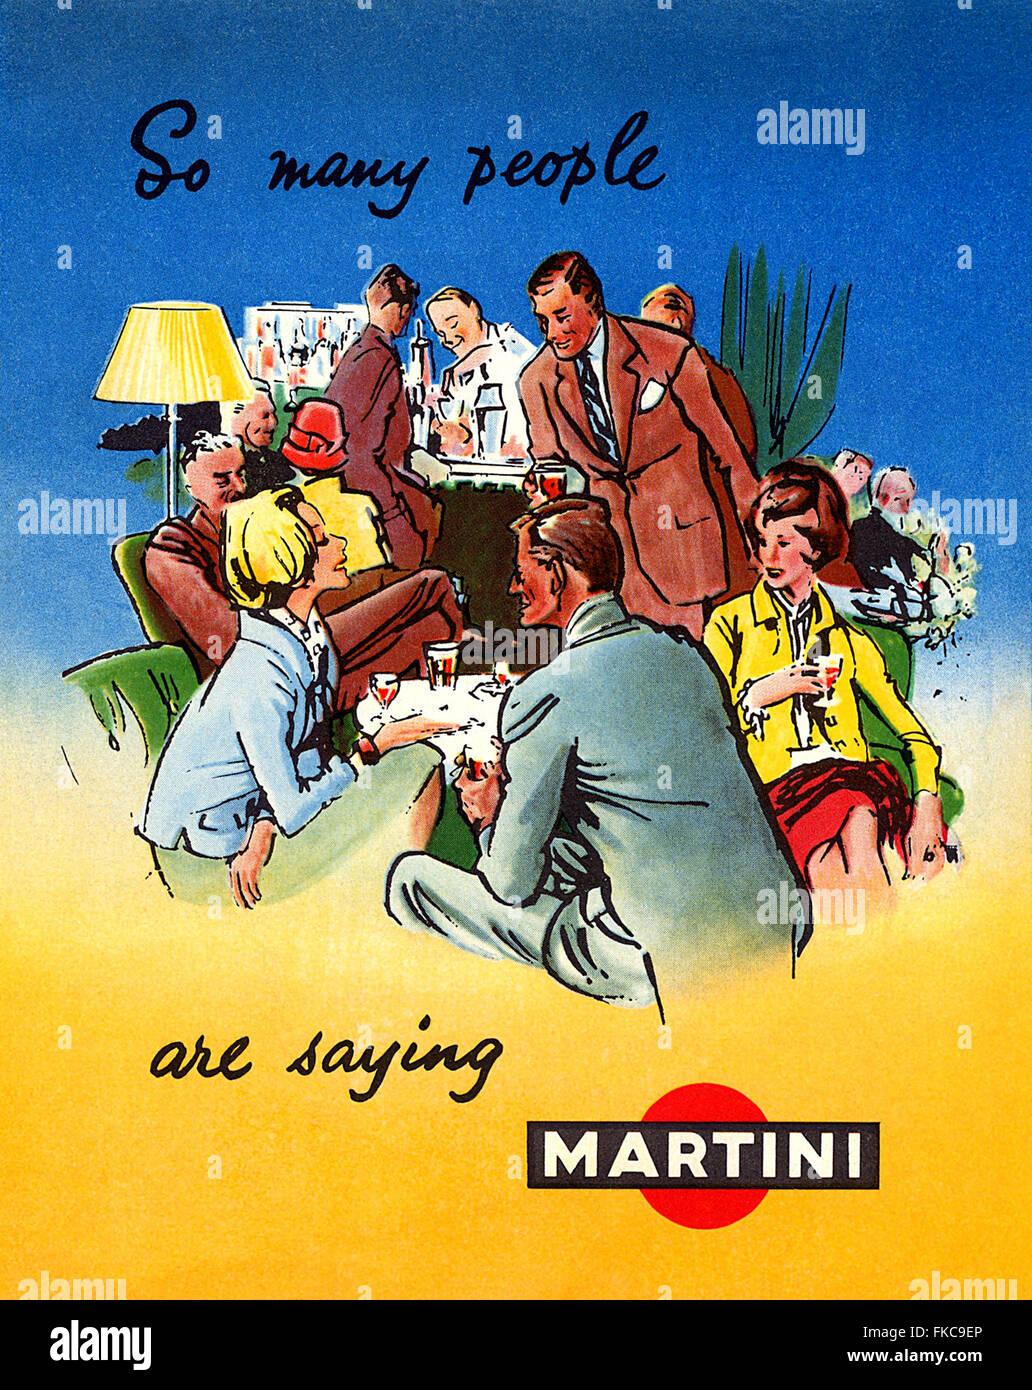 USA Martini Magazine Advert - Stock Image